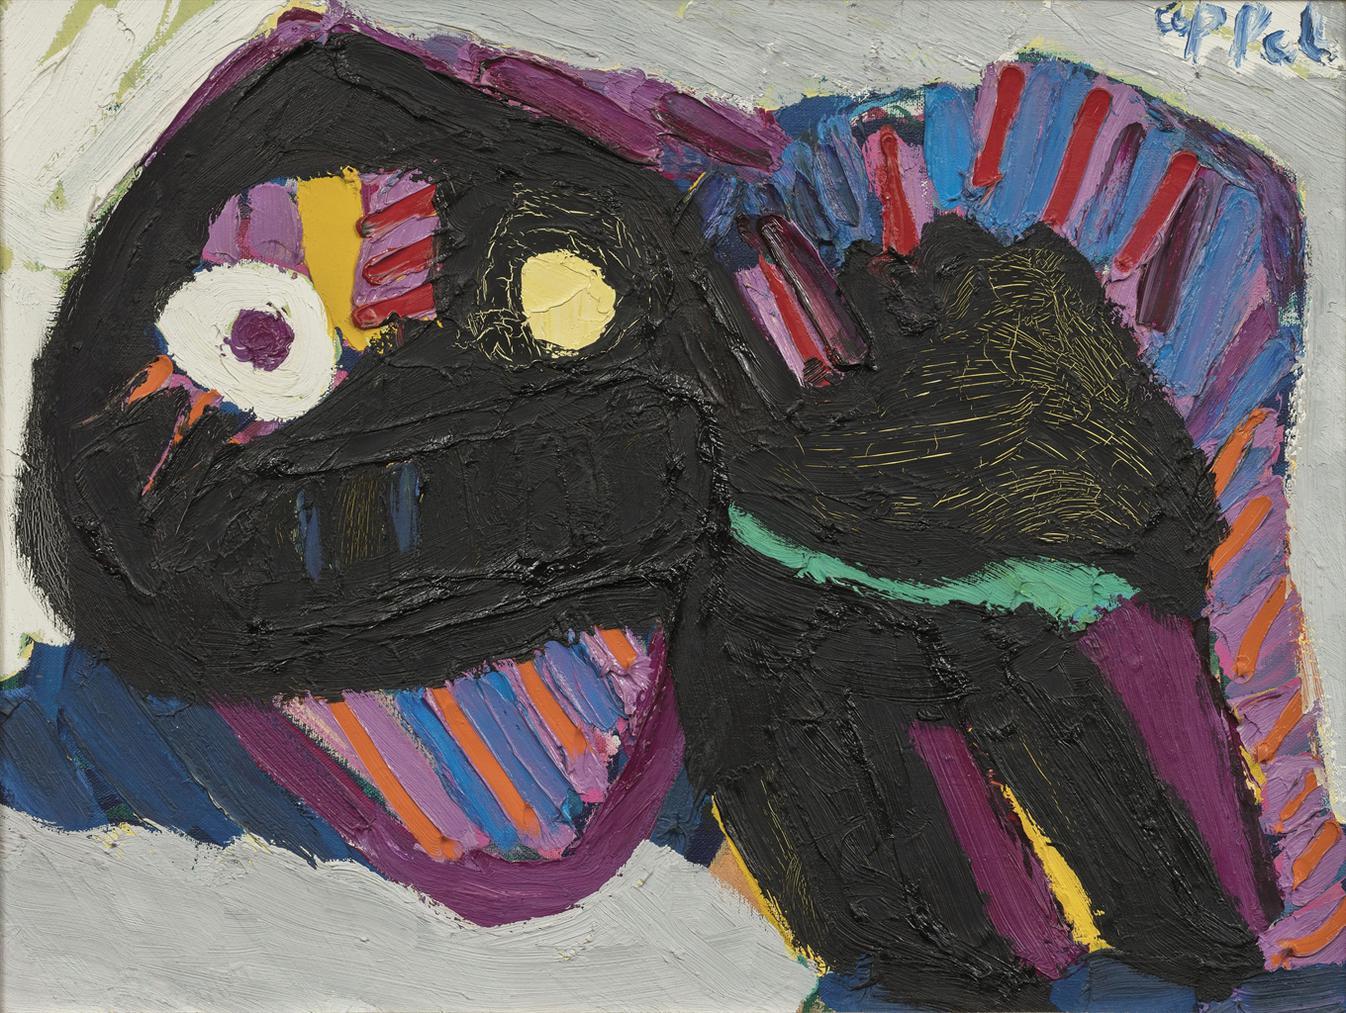 Karel Appel-Black Cat-1979